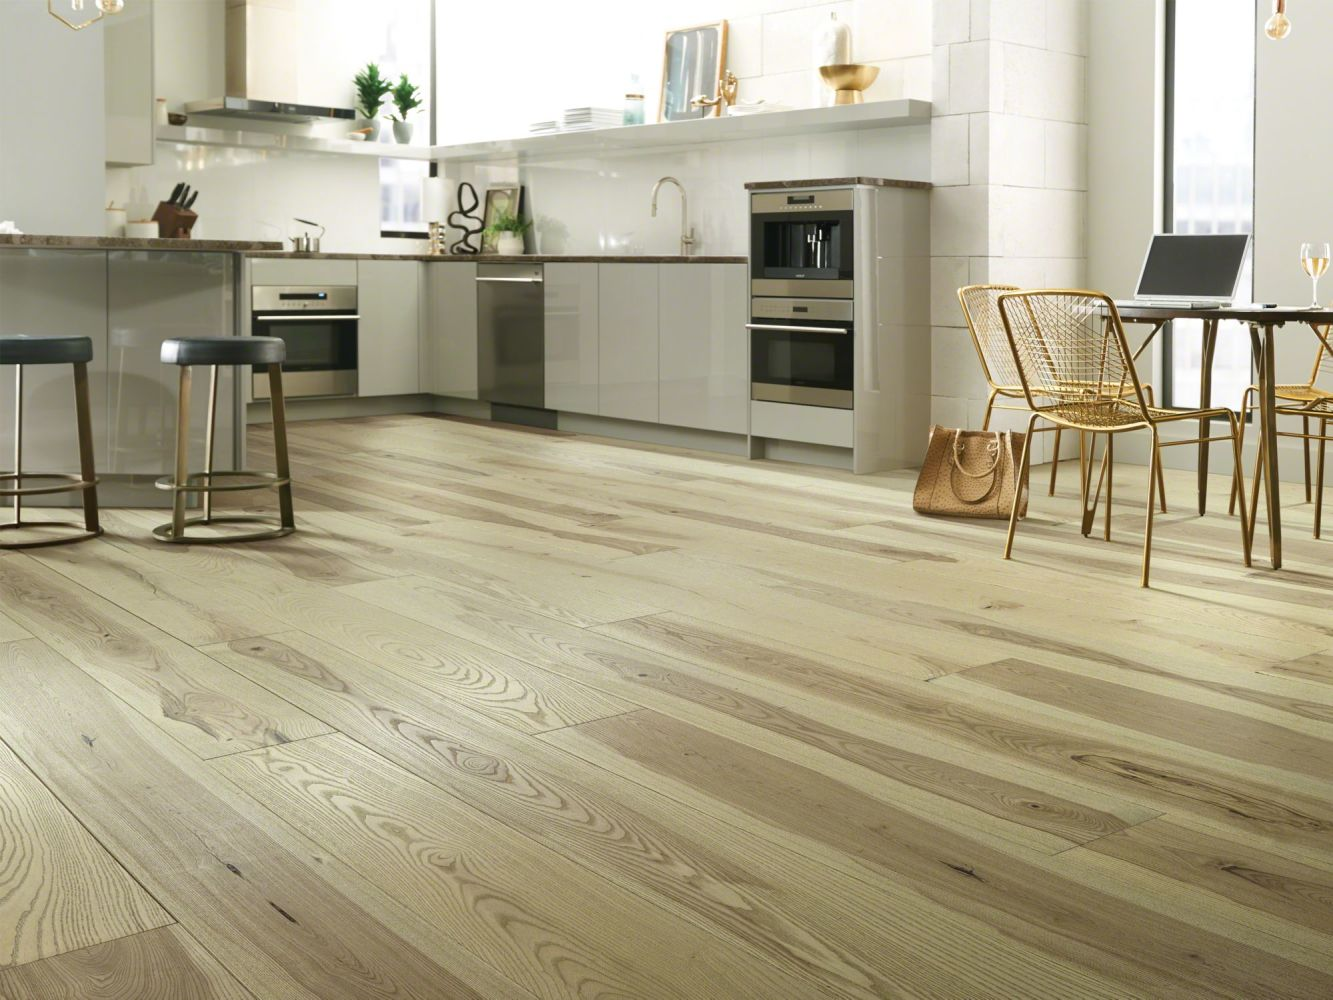 Shaw Floors Repel Hardwood Reflections Ash Native 01026_SW659